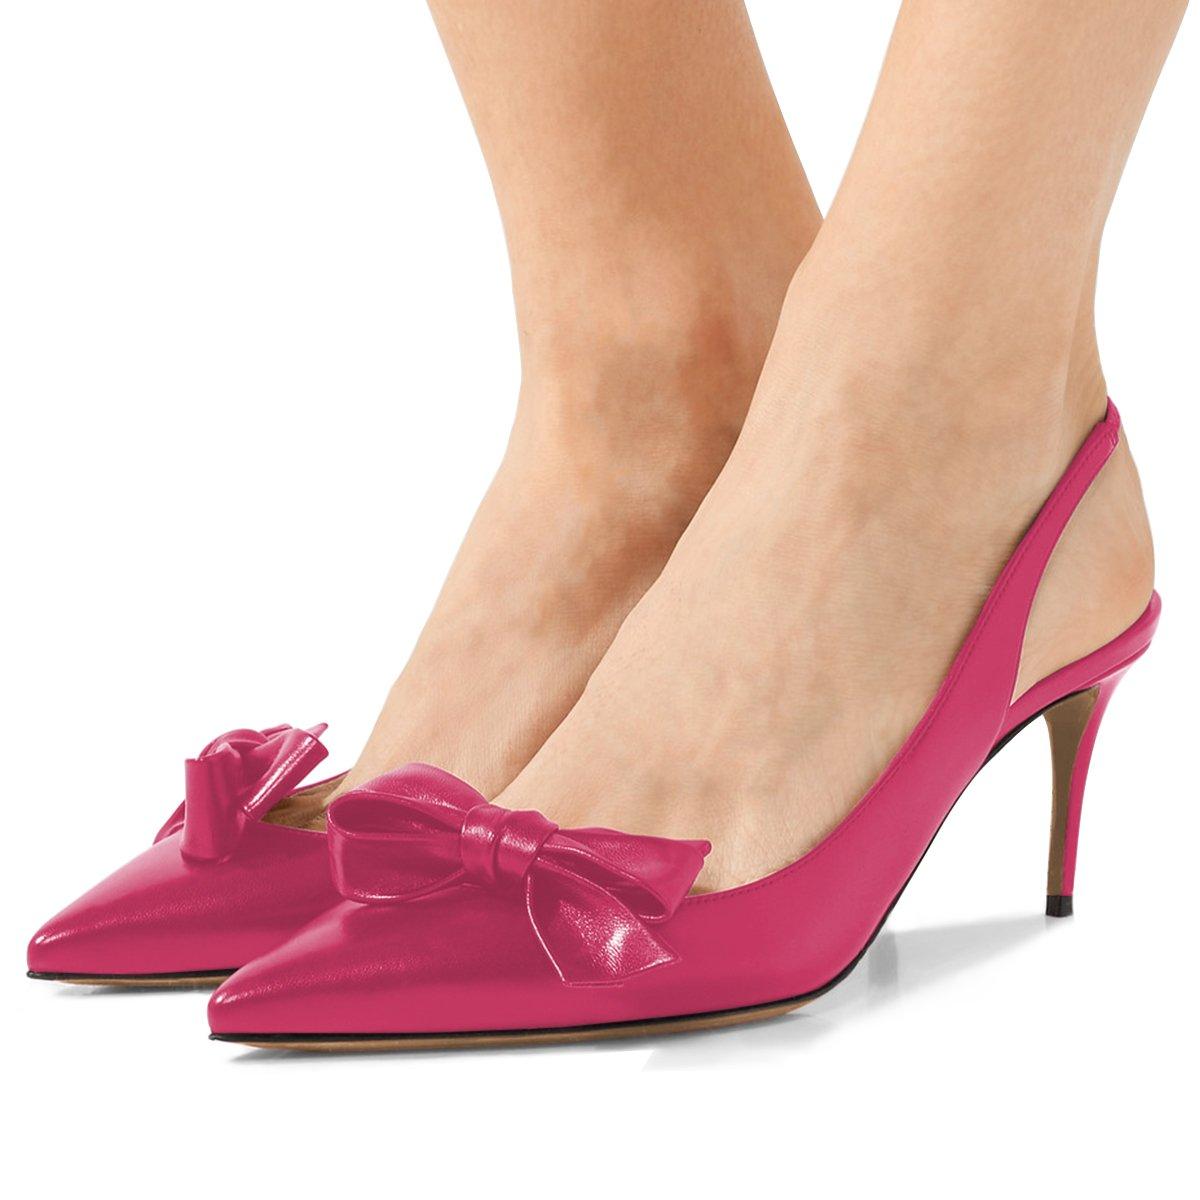 XYD Women Fashion Pointed Toe Slingback Pumps High Heel Slip On Dress Shoes with Bows B0799G7LQ5 11 B(M) US Hot Pink